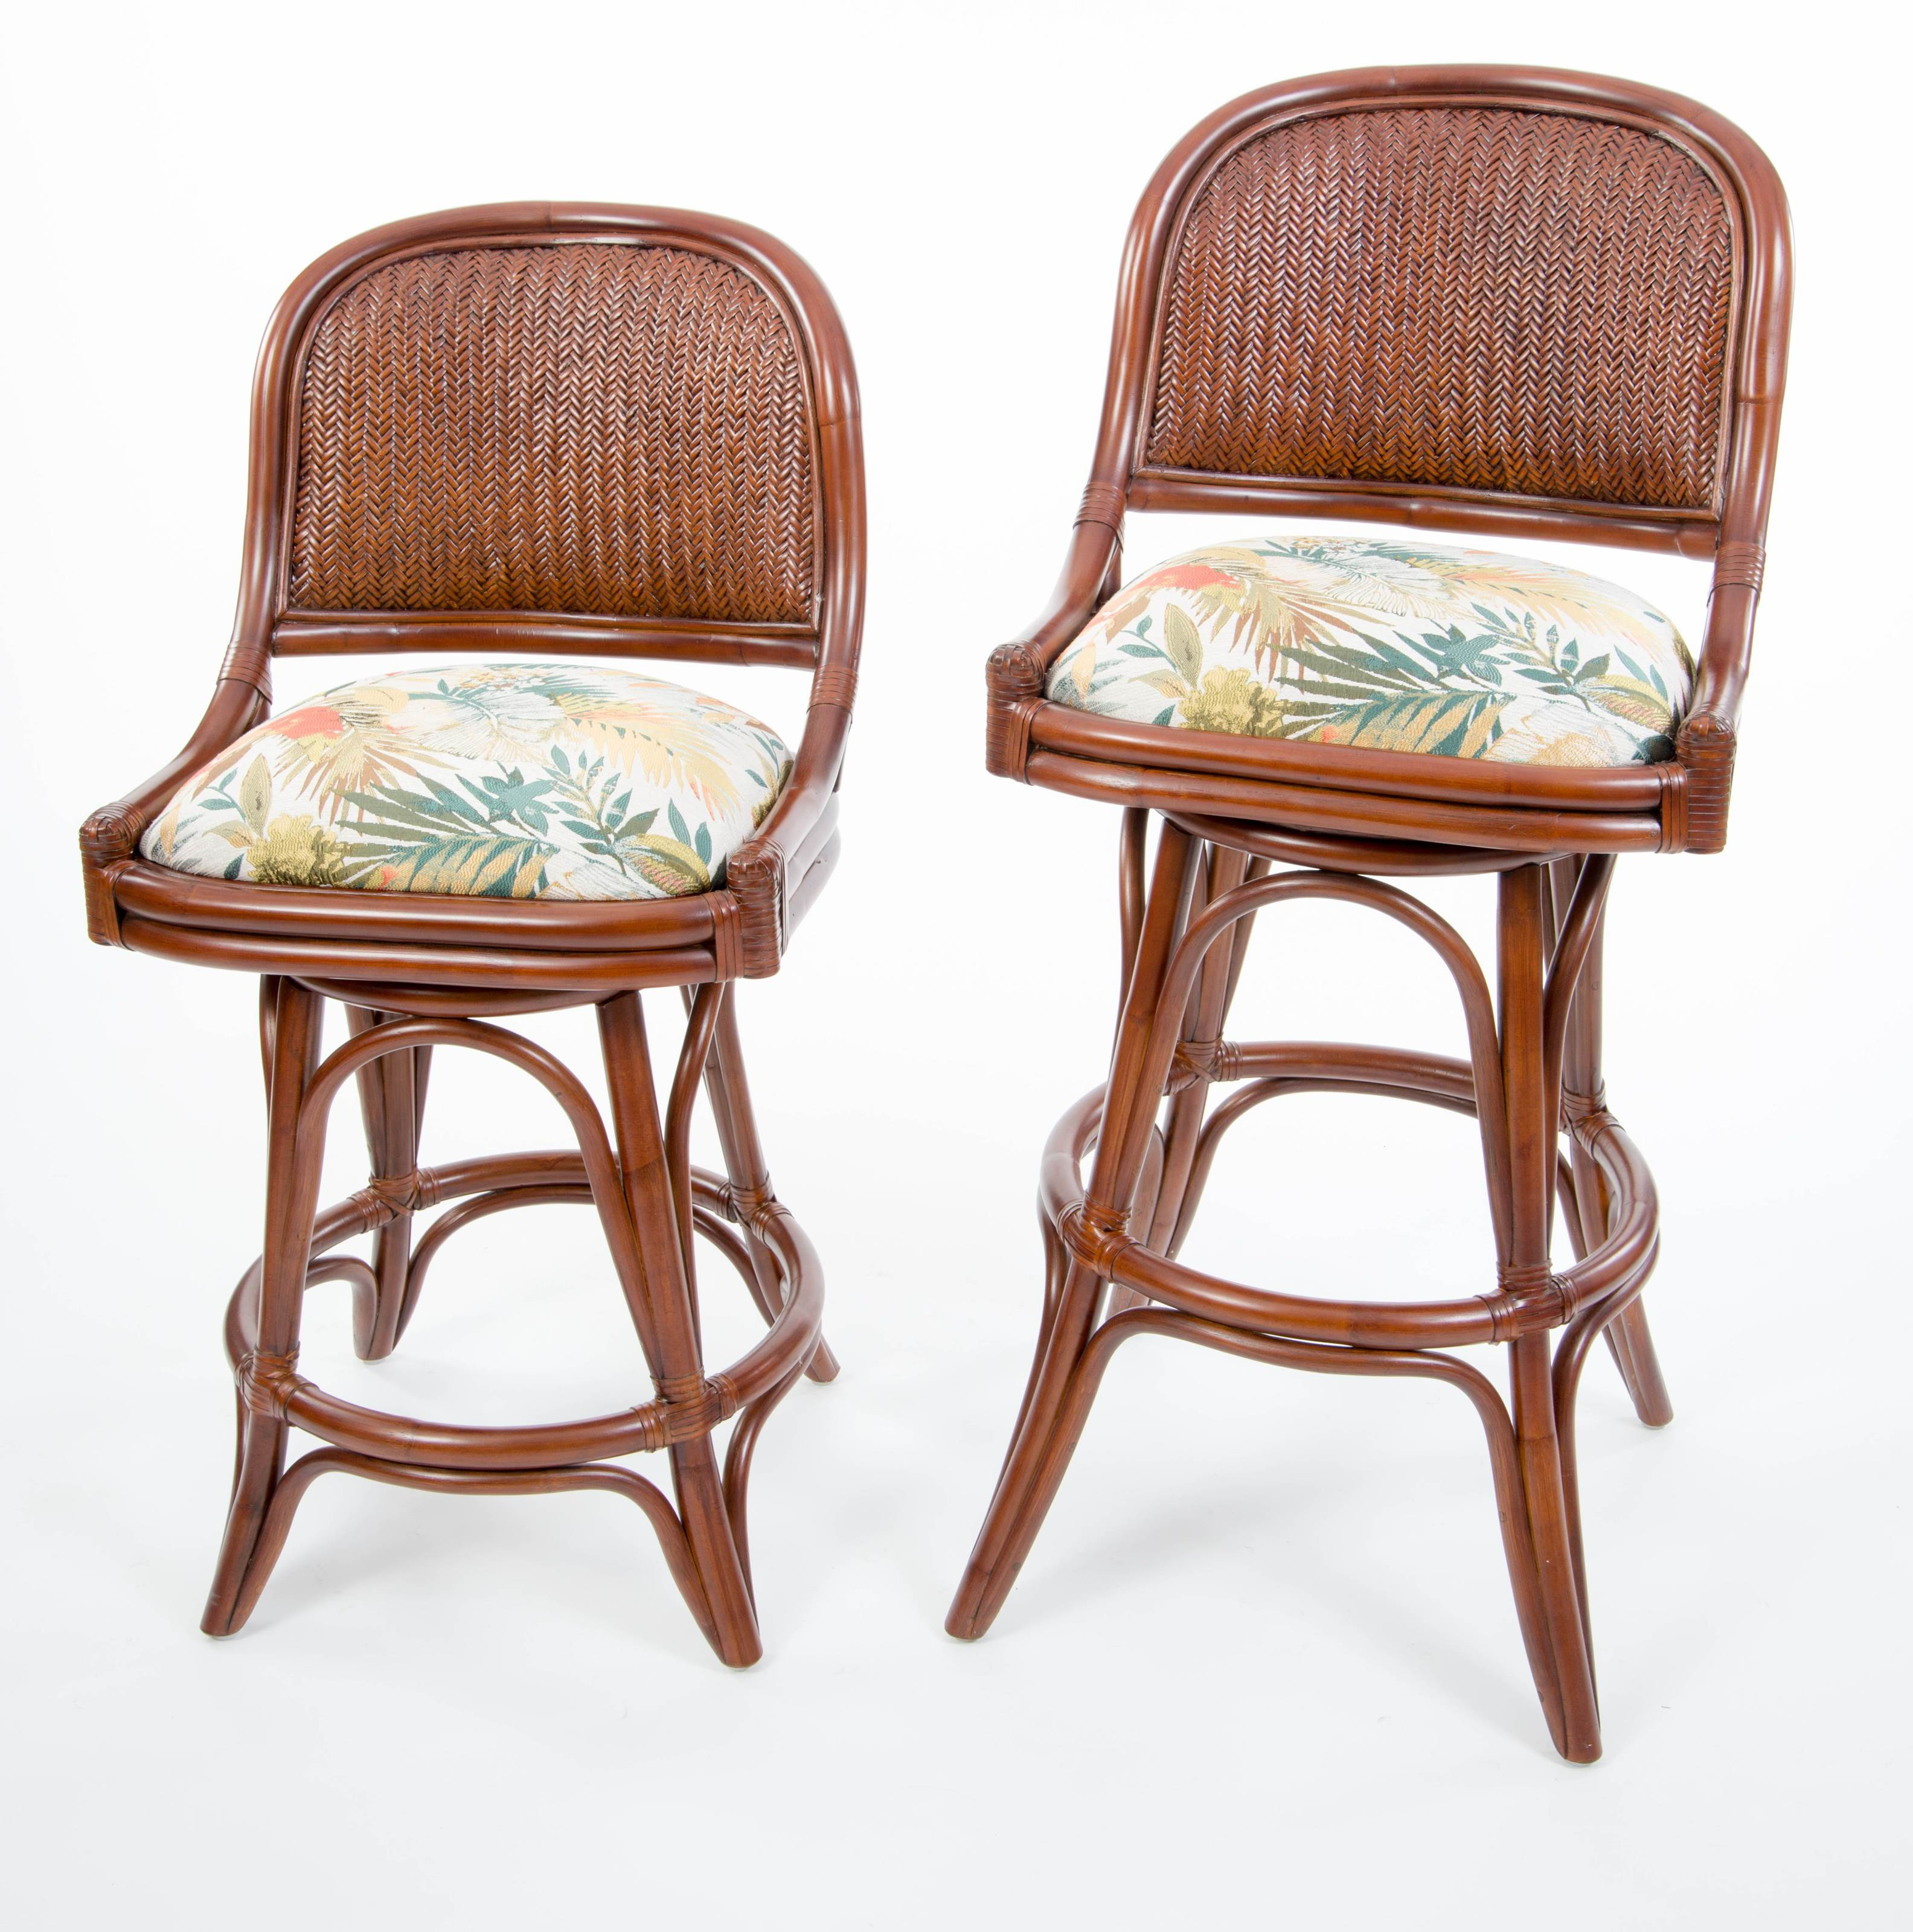 Pleasant Cayman Armless Swivel Barstool Sienna Finish Alexander Short Links Chair Design For Home Short Linksinfo